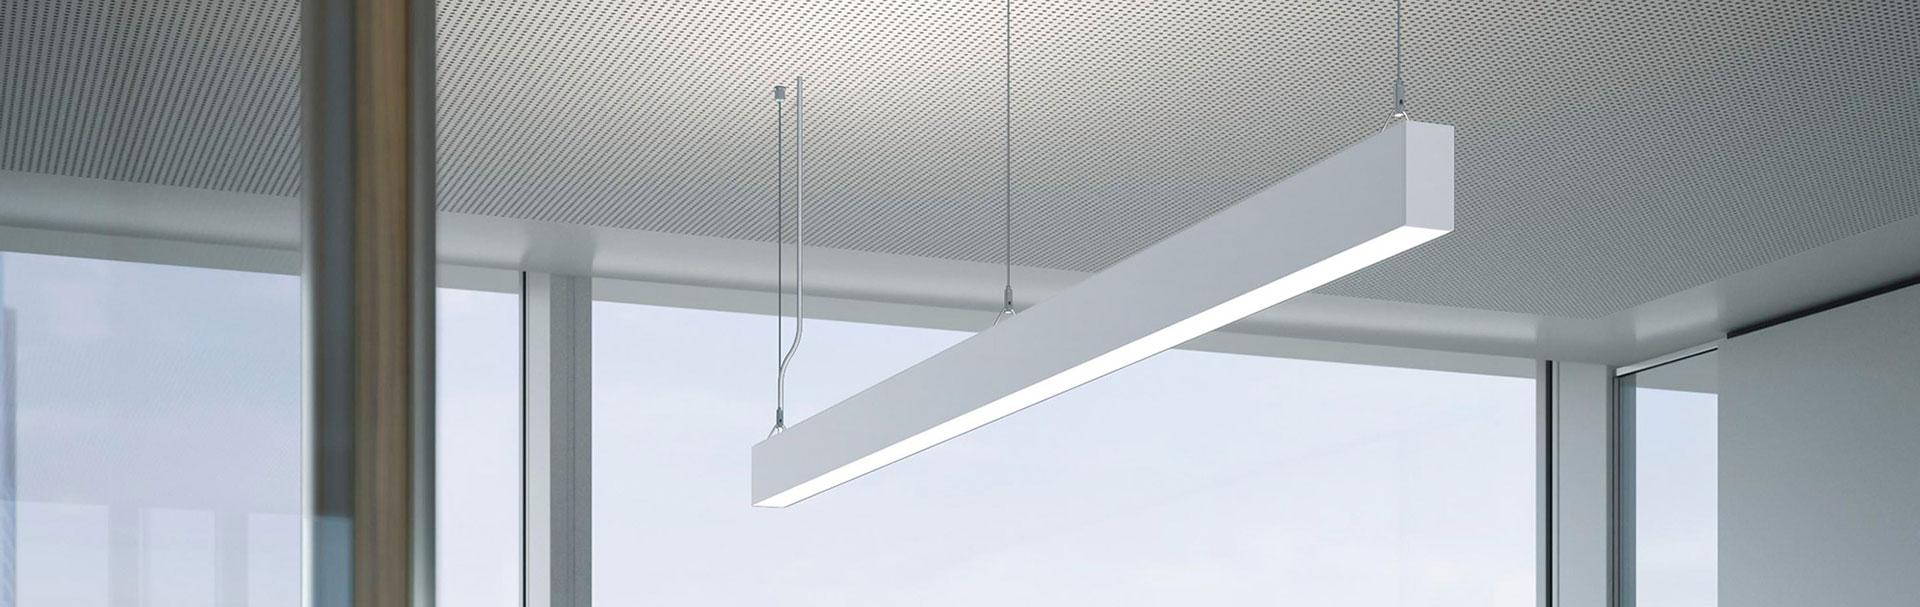 Light Waldmann line Individuel Engineers Luminaire Of Idoo lF13TKJc